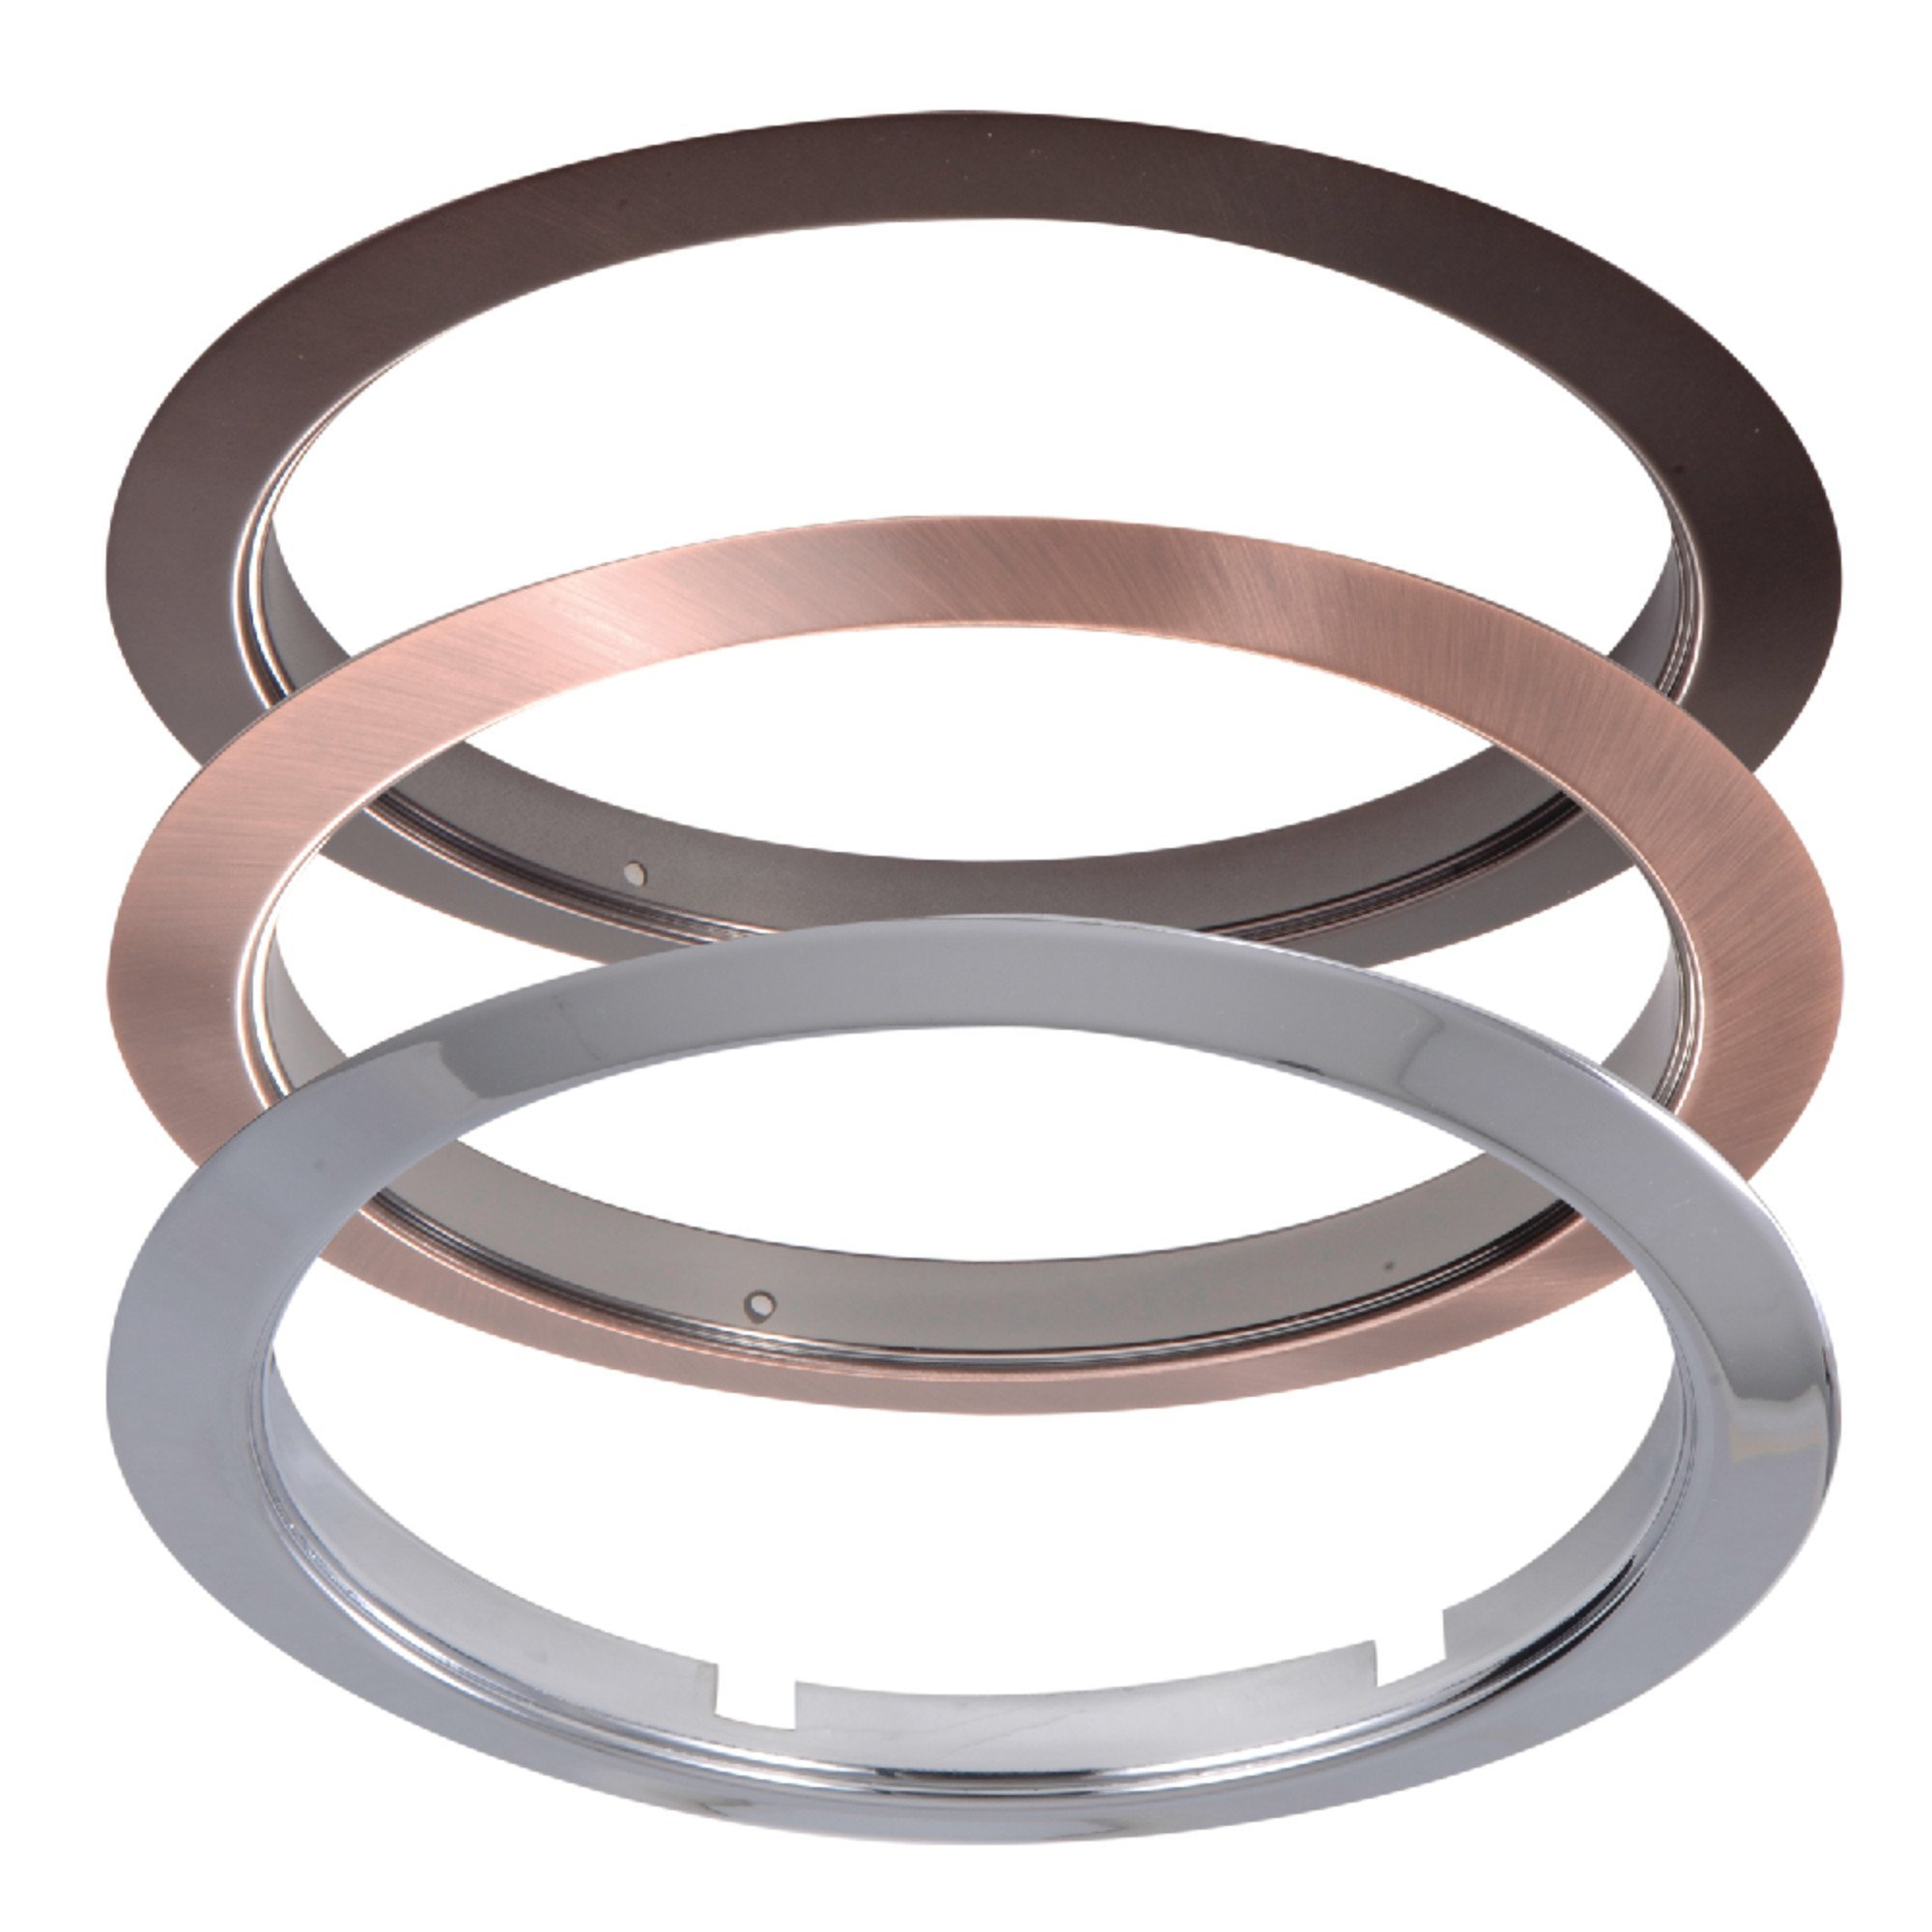 Halo TRM6TBZ Trim Ring, 6'' Metal, Tuscan Bronze